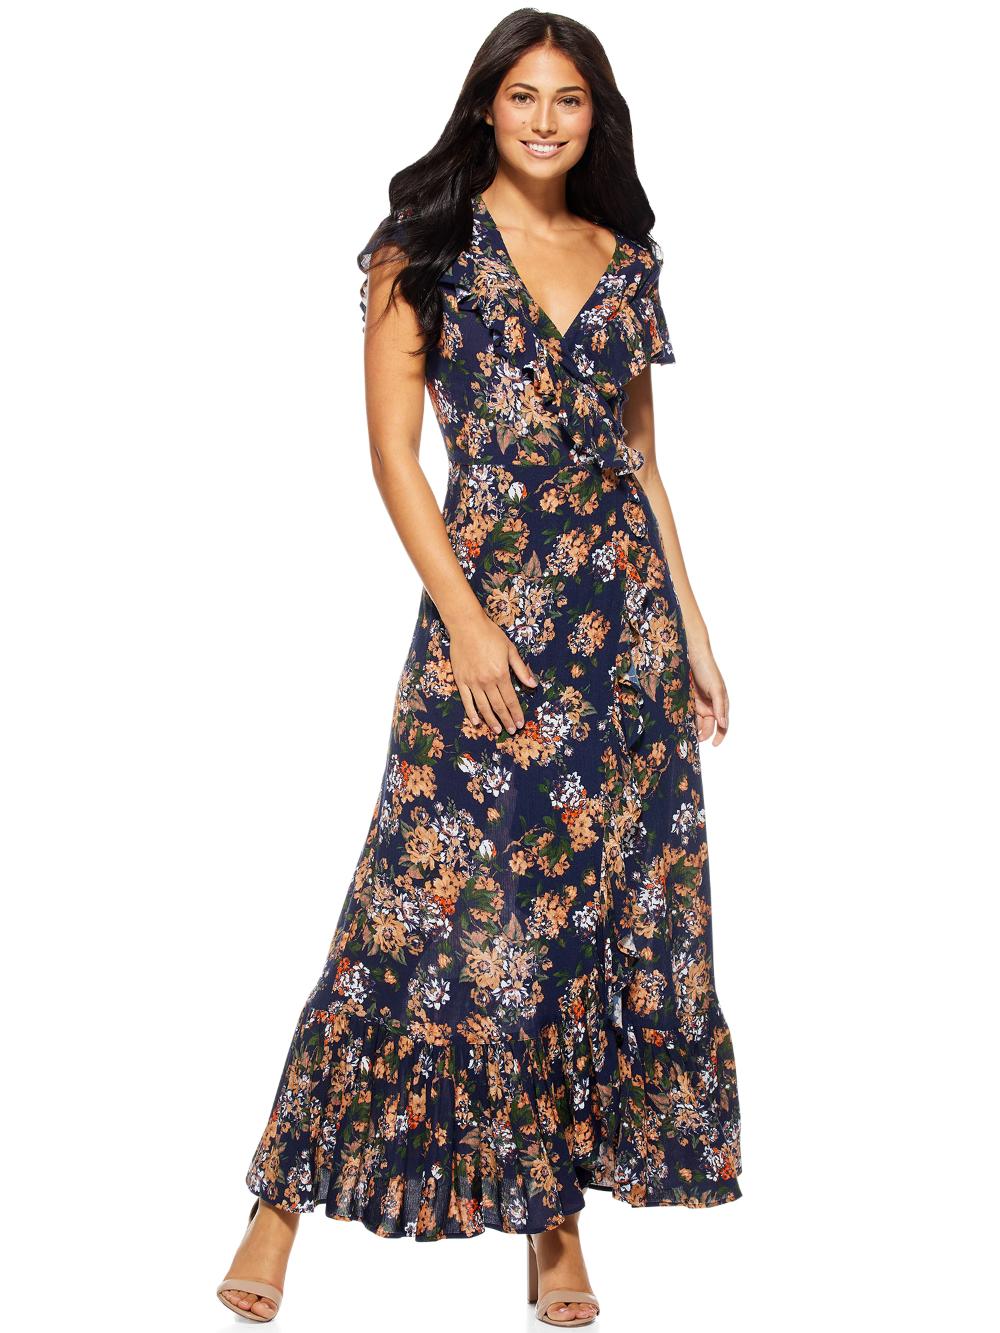 Free 2 Day Shipping Buy Sofia Jeans By Sofia Vergara Women S Short Sleeve Wrap Maxi Dress At Walmart Com Maxi Dress Womens Maxi Dresses Maxi Wrap Dress [ 1333 x 1000 Pixel ]